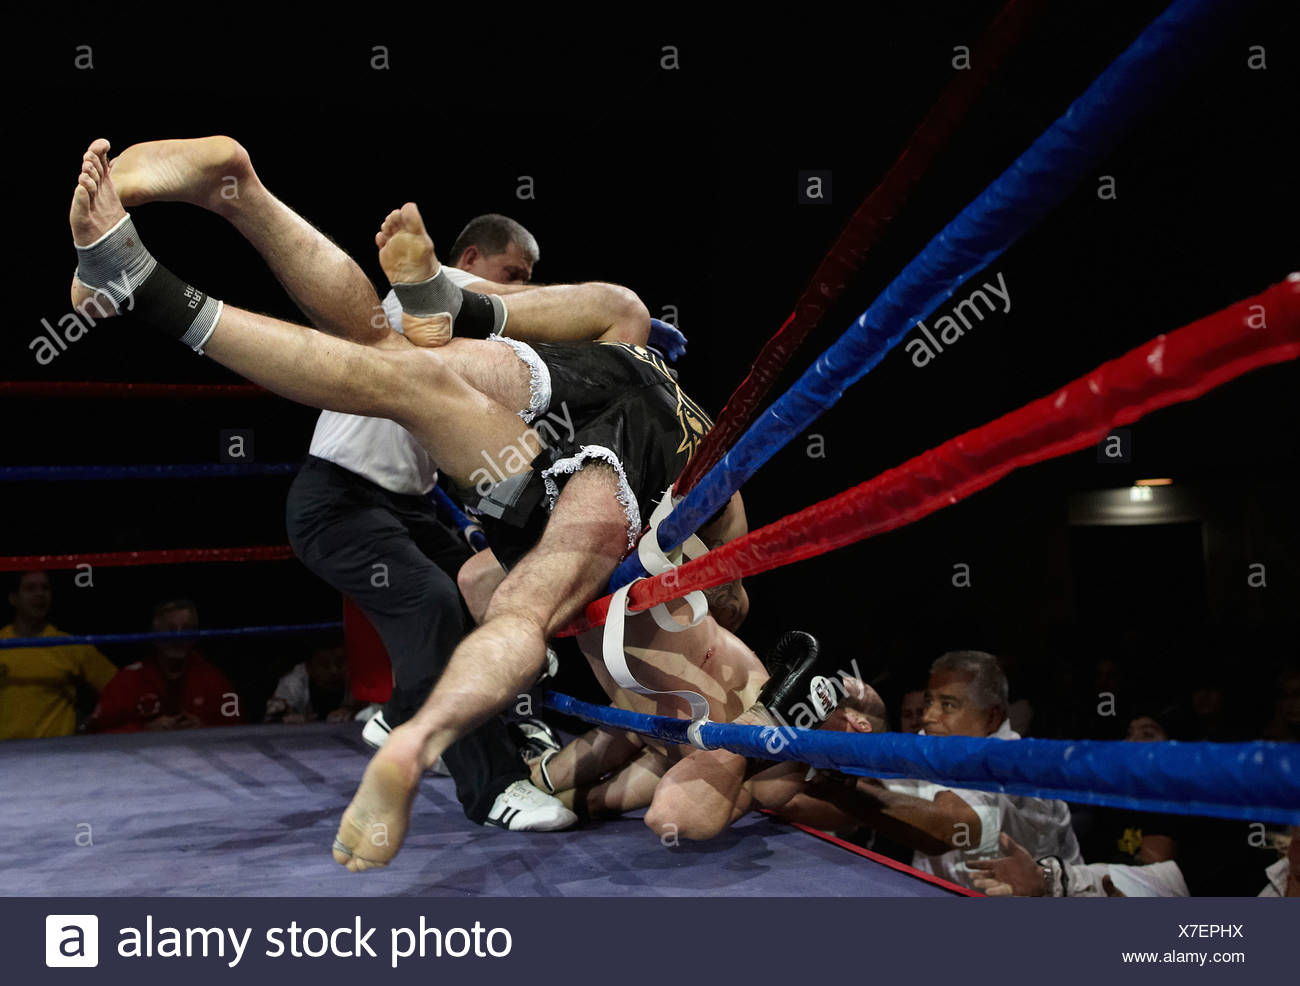 Atakan Arslan, right, versus Bakkar Barakat, Profi Thai and Kickboxing Gala, Koblenz, 13.10.2012, Koblenz, Rhineland-Palatinate - Stock Image